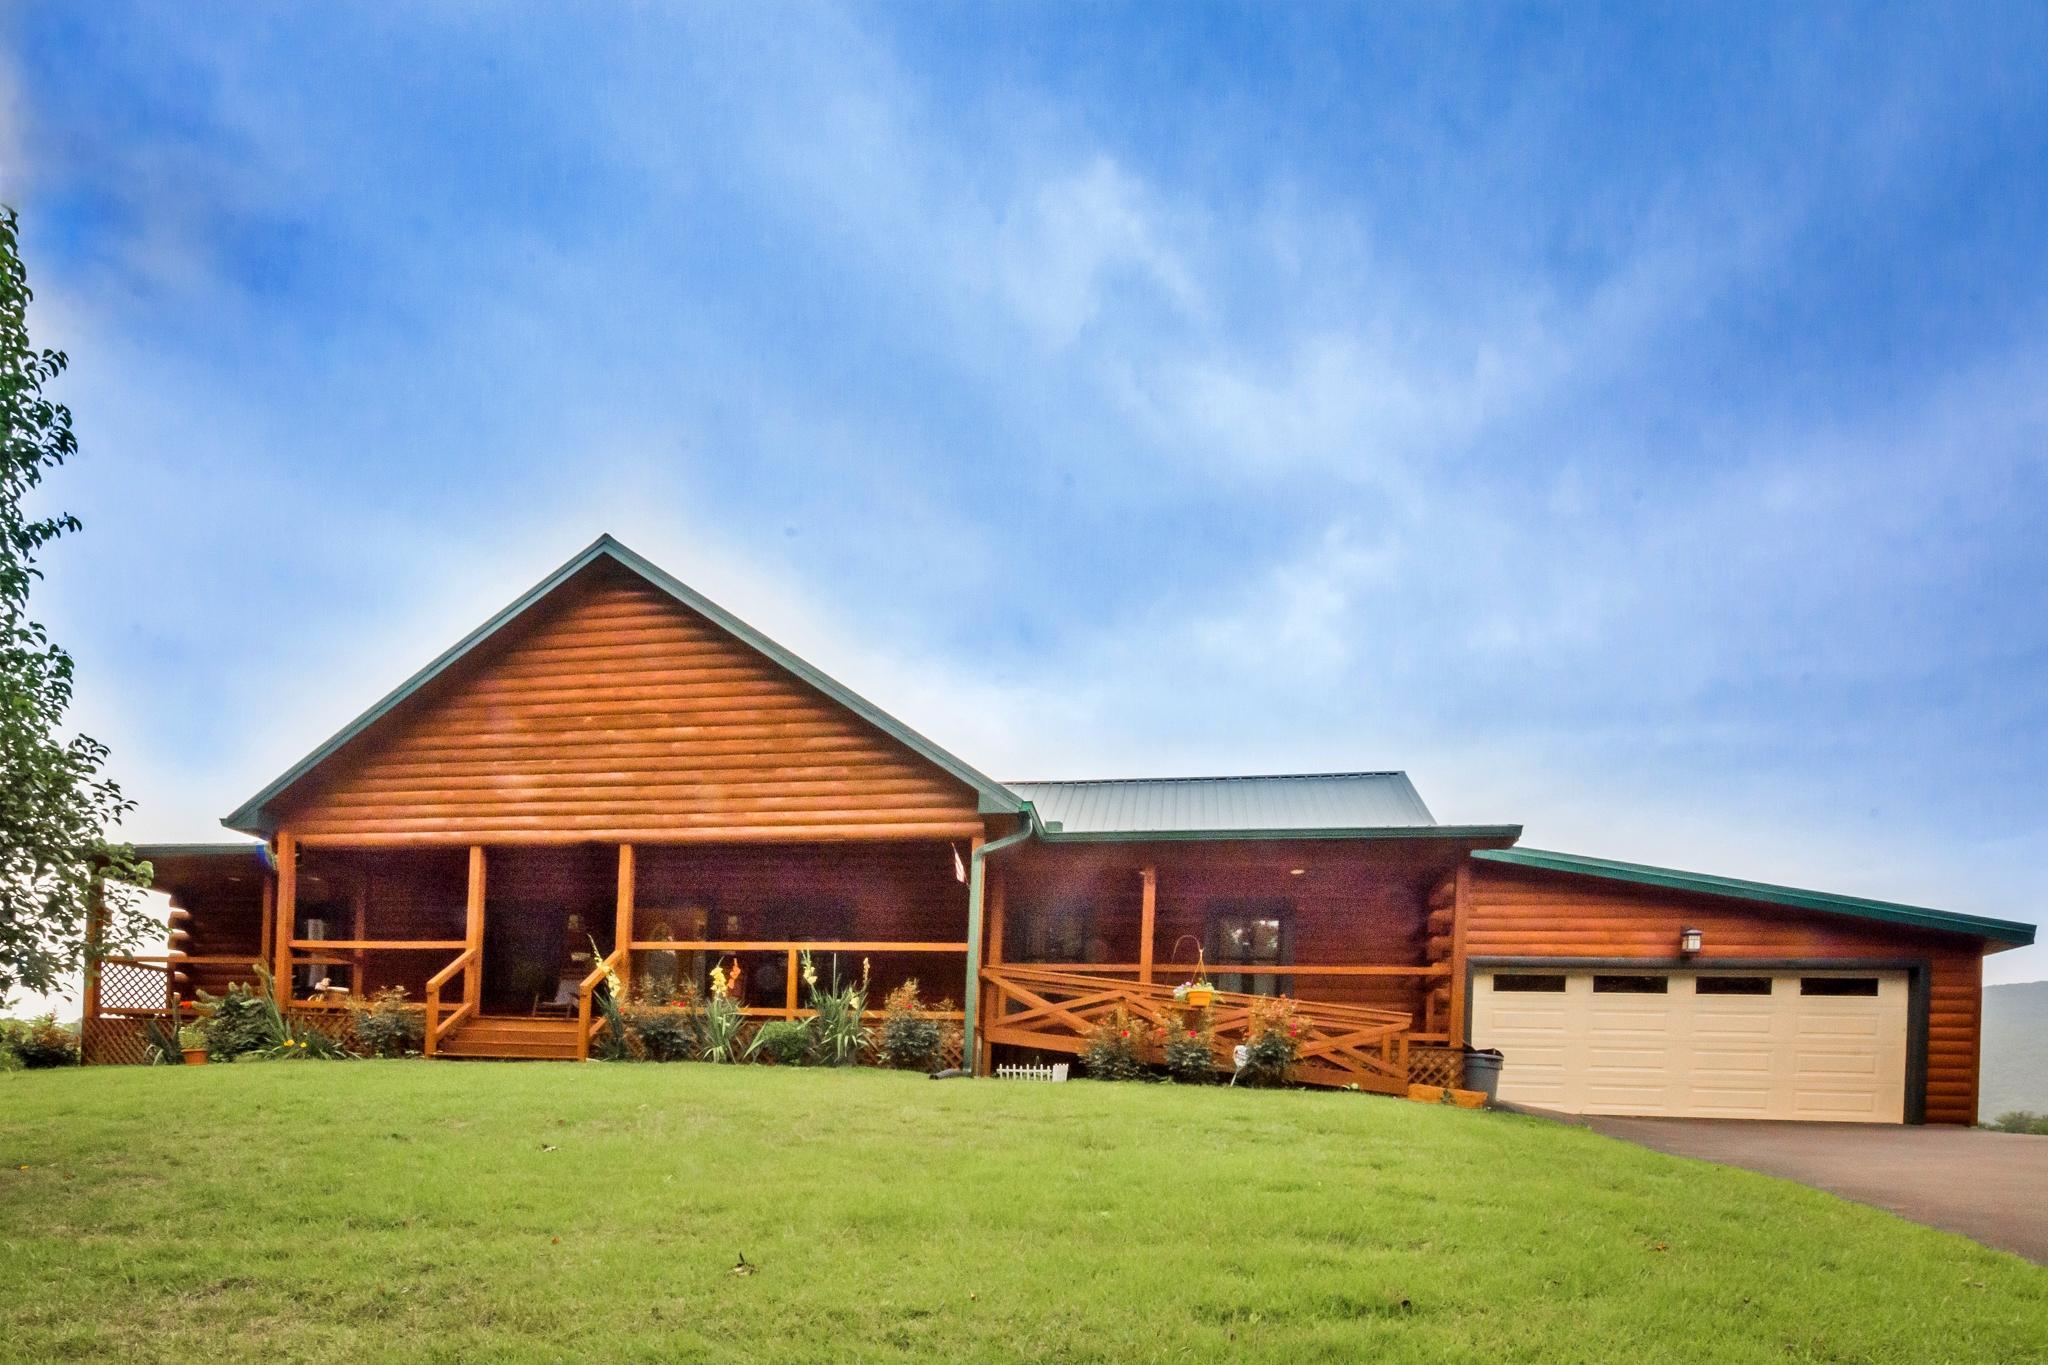 1374 Hudlow Rd, Dunlap, TN 37327